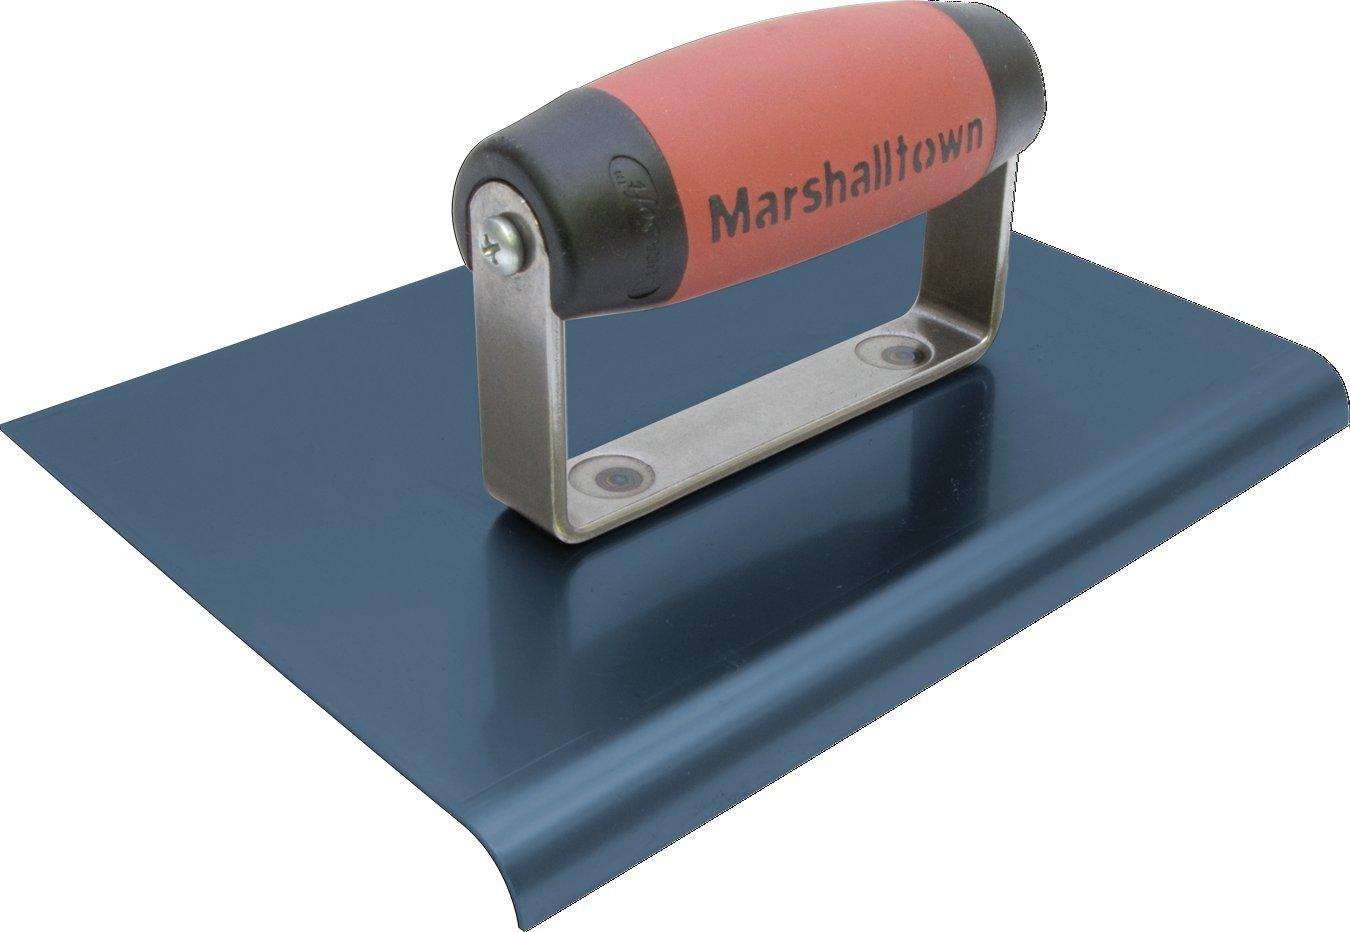 MARSHALLTOWN 167BD 9-Inch by 6-Inch The Premier Line Blue Steel Edger-3/4-Inch Radius 7/8-Inch Lip DuraSoft Handle by MARSHALLTOWN The Premier Line